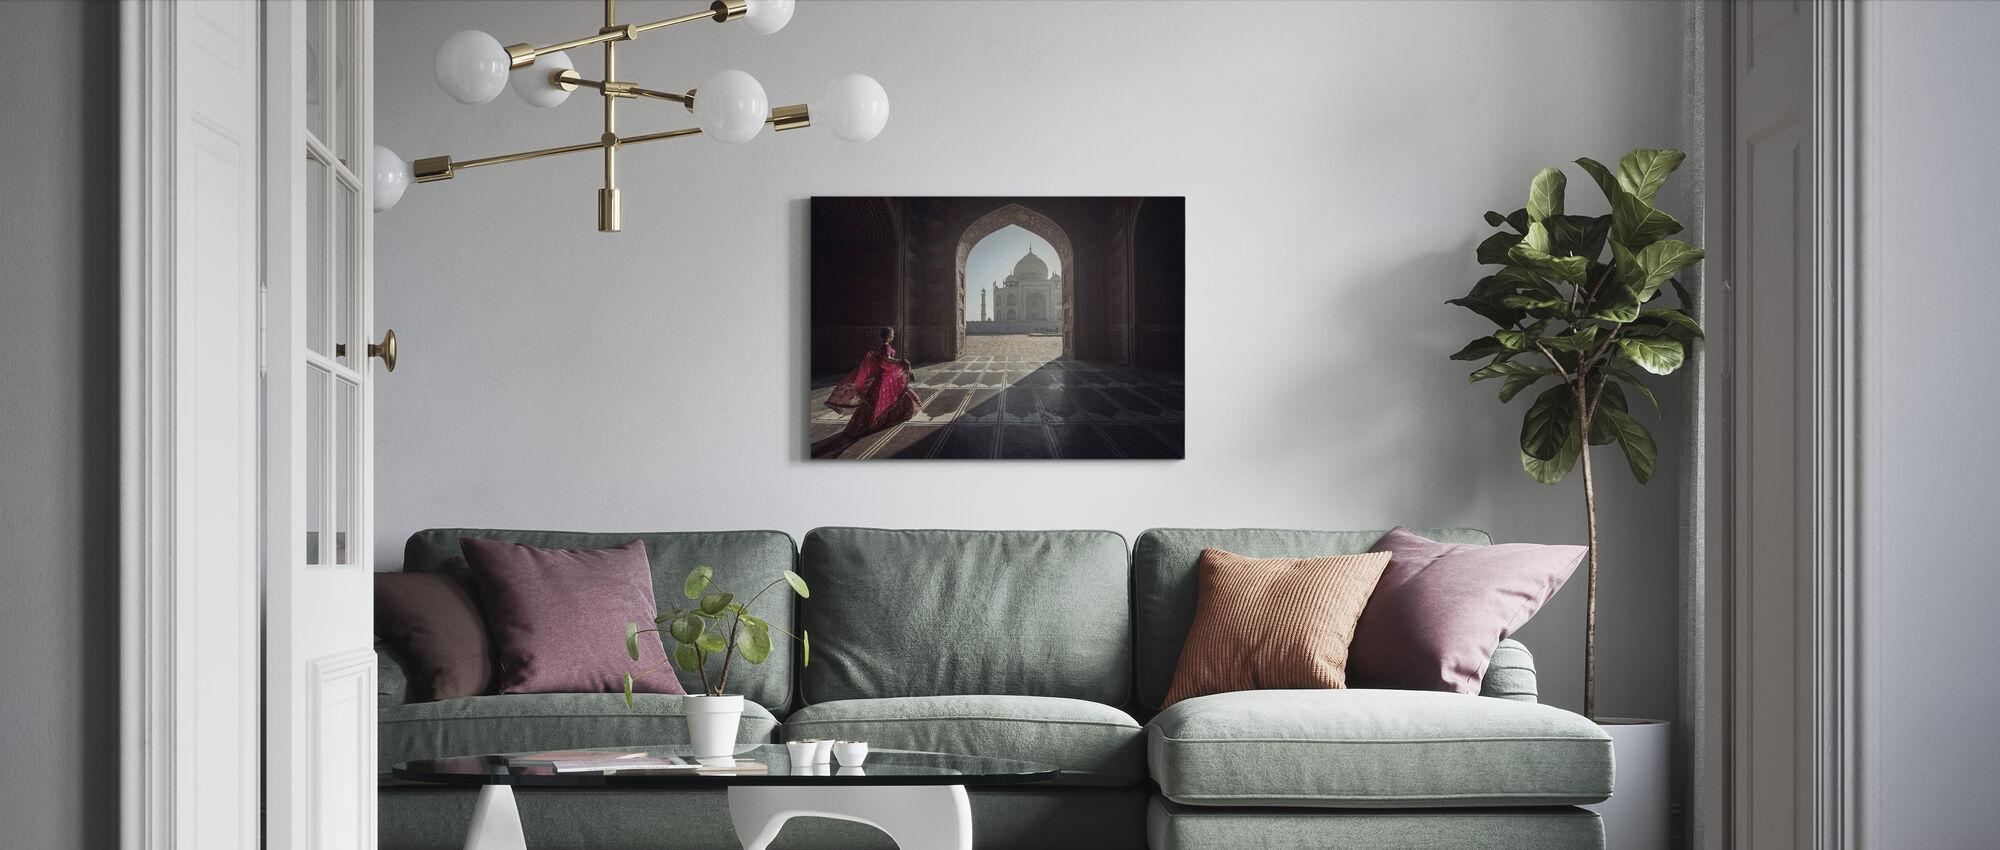 Tajmahal - Canvastaulu - Olohuone